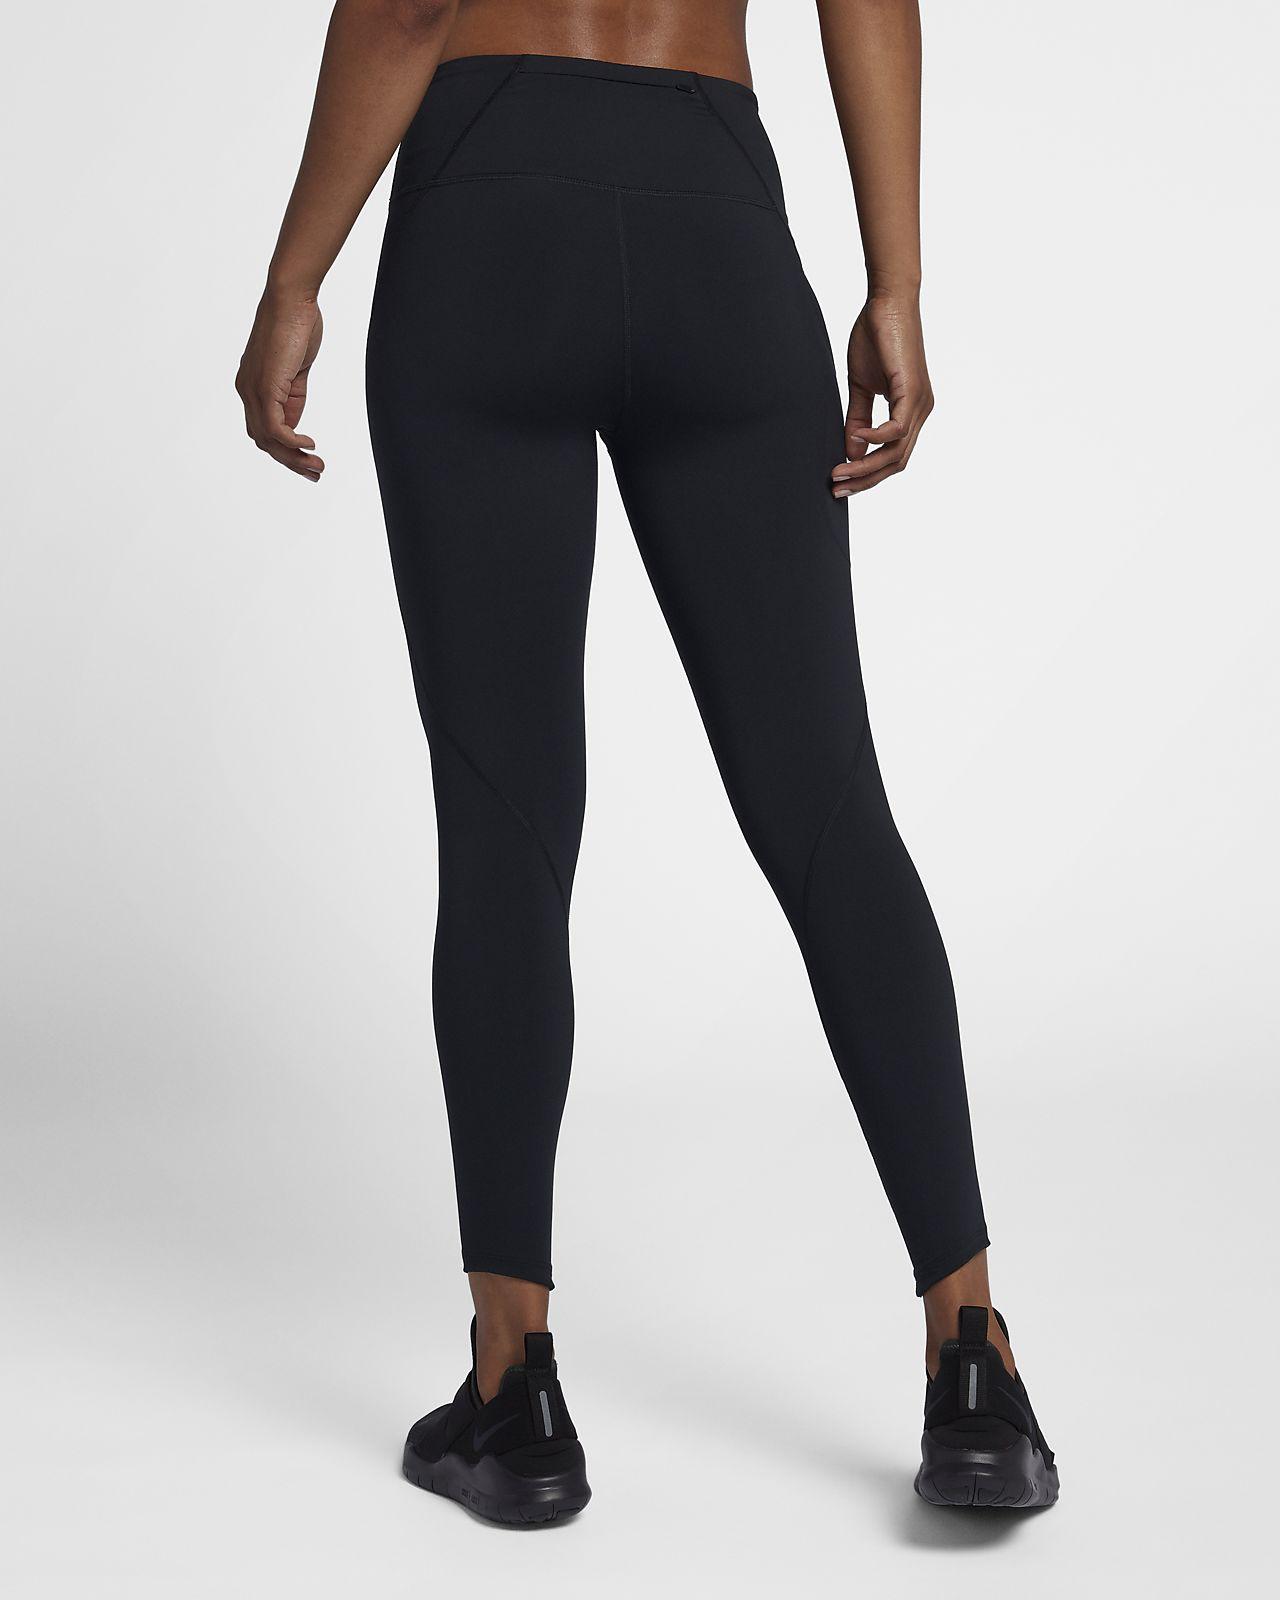 dadad243b Nike Epic Lux Women s High-Rise 7 8 Running Tights. Nike.com GB